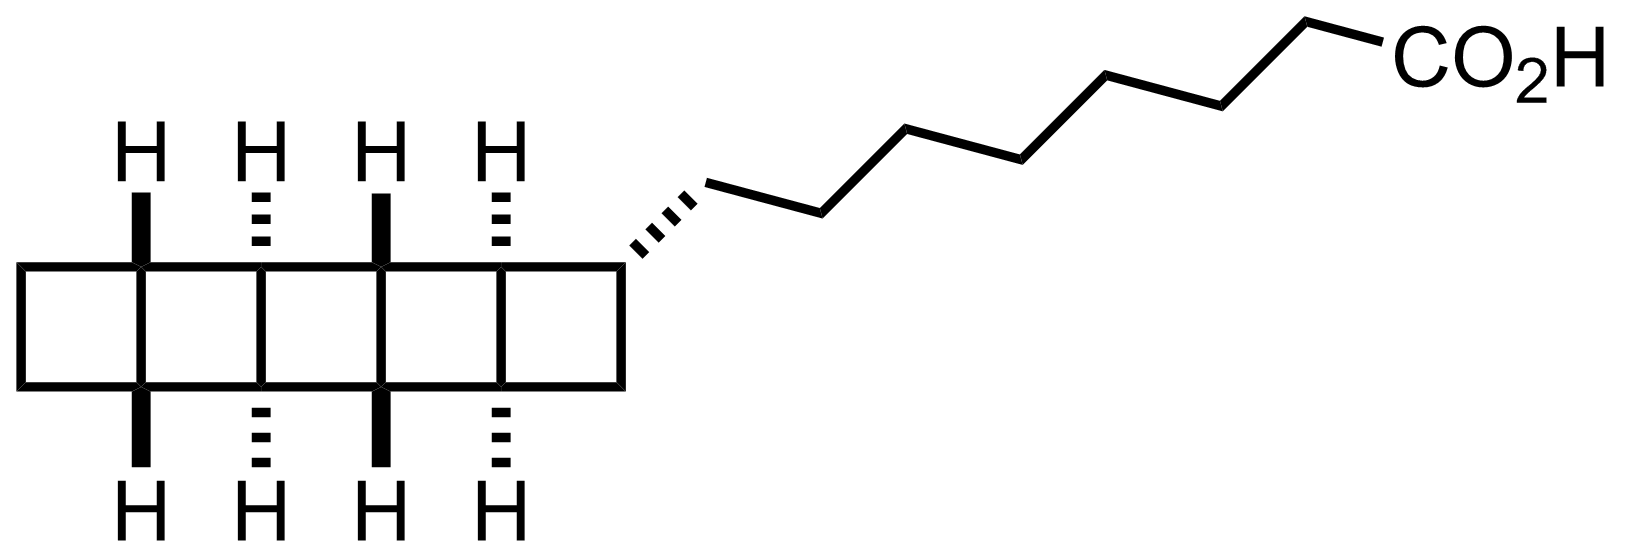 Structure of Pentacycloanammoxic Acid